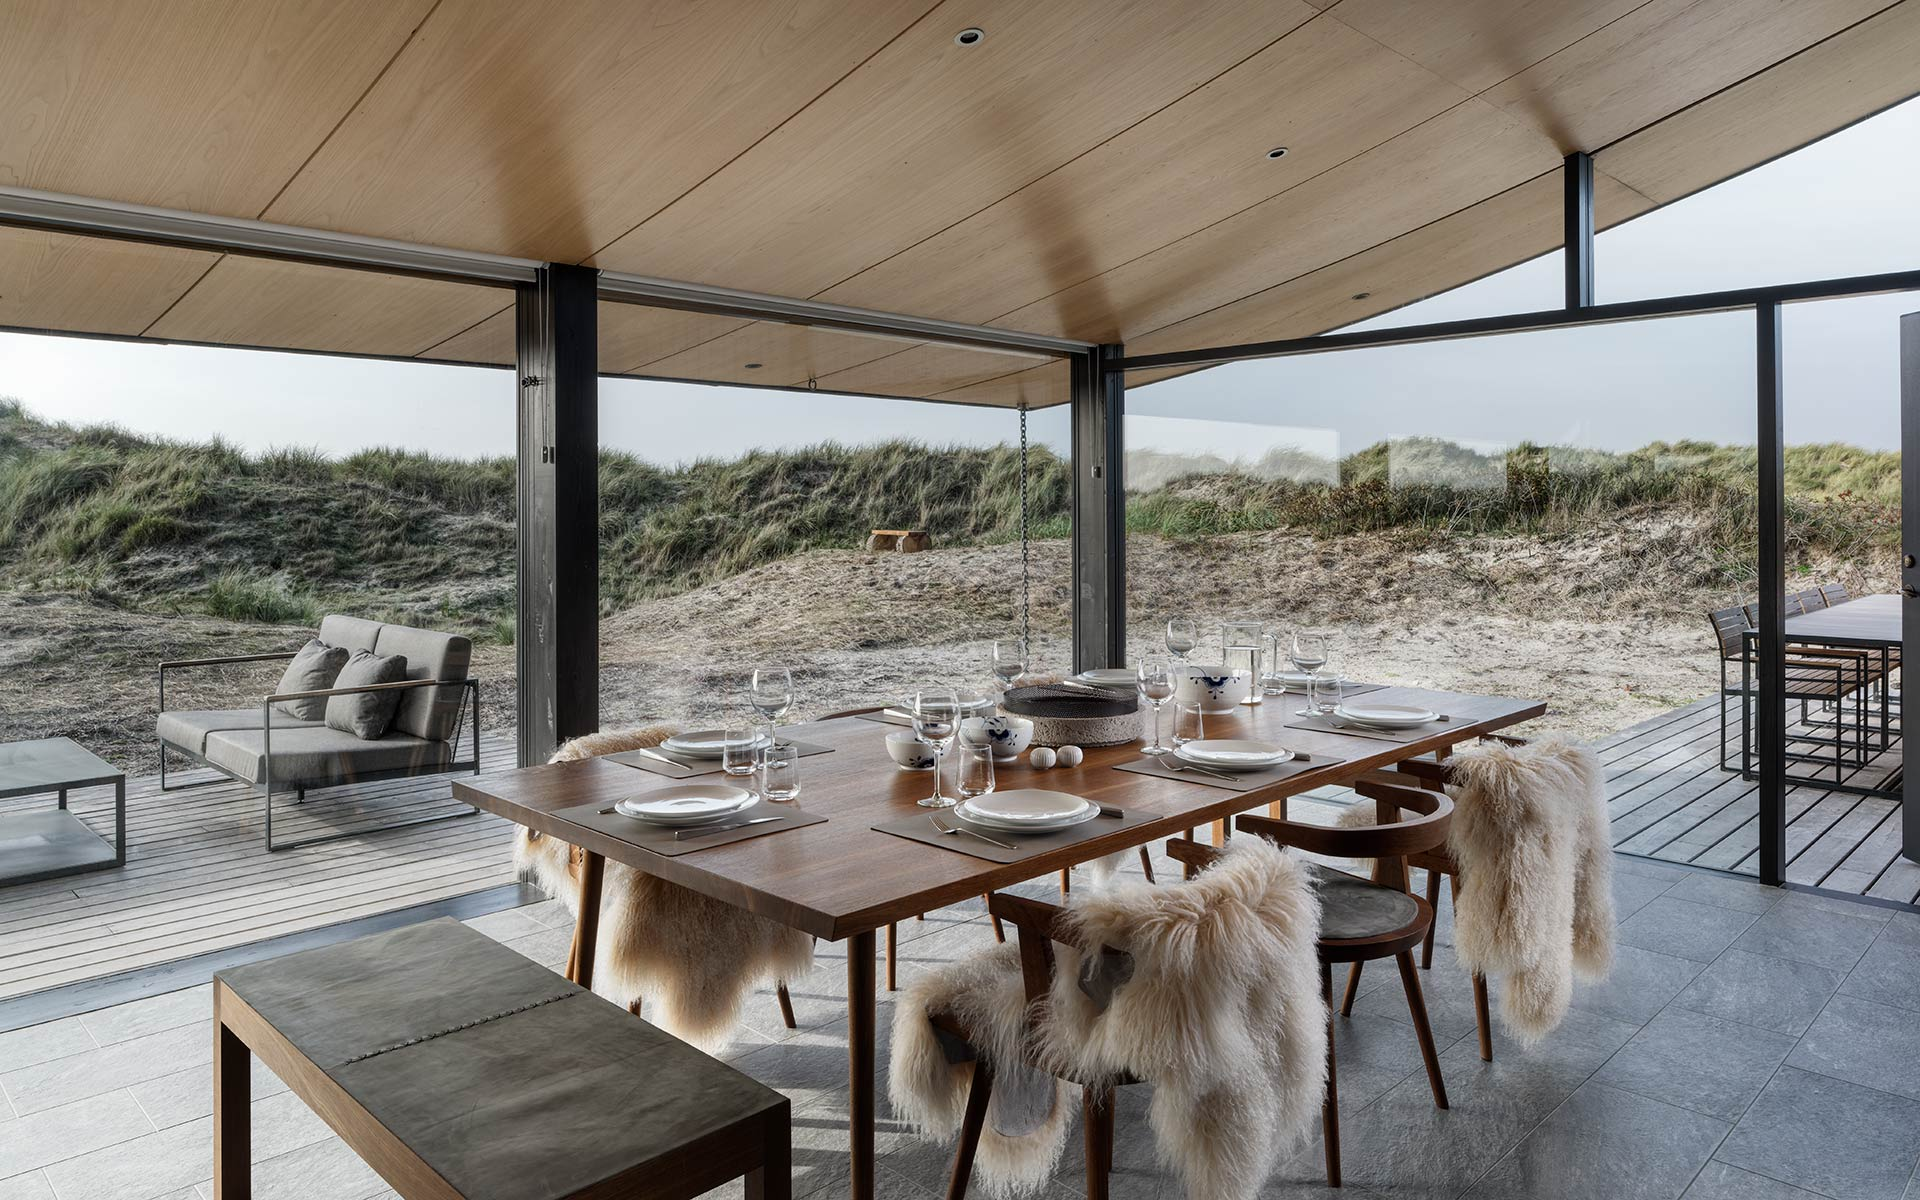 Summer House on Fanø, Denmark. Interior design by Tollgård Design Group. Architect: Knud Holscher